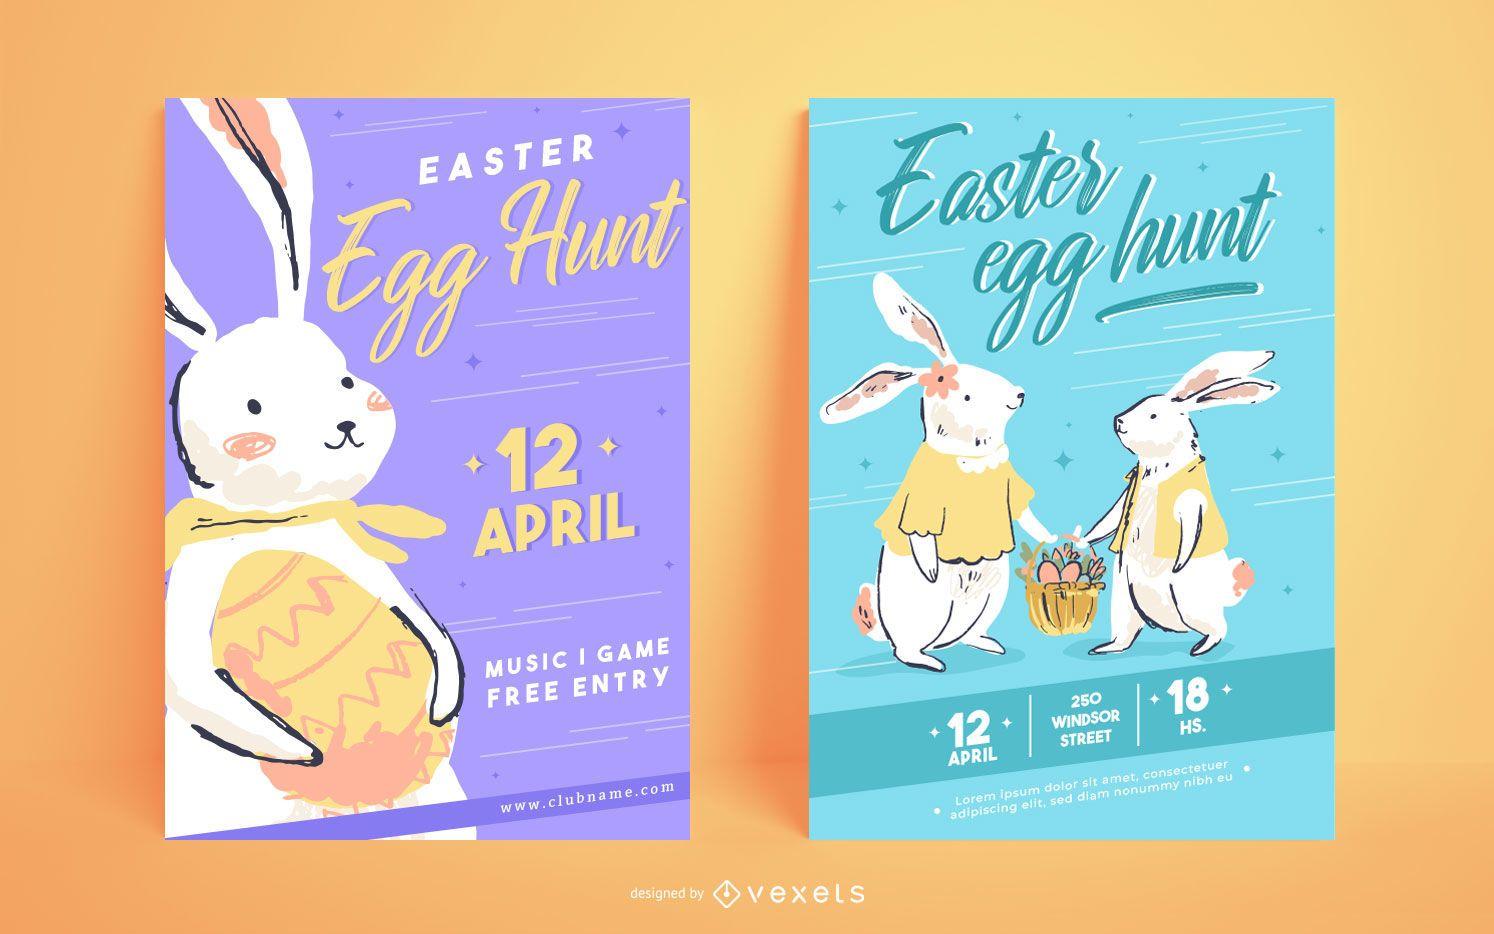 Easter egg hunt poster templates